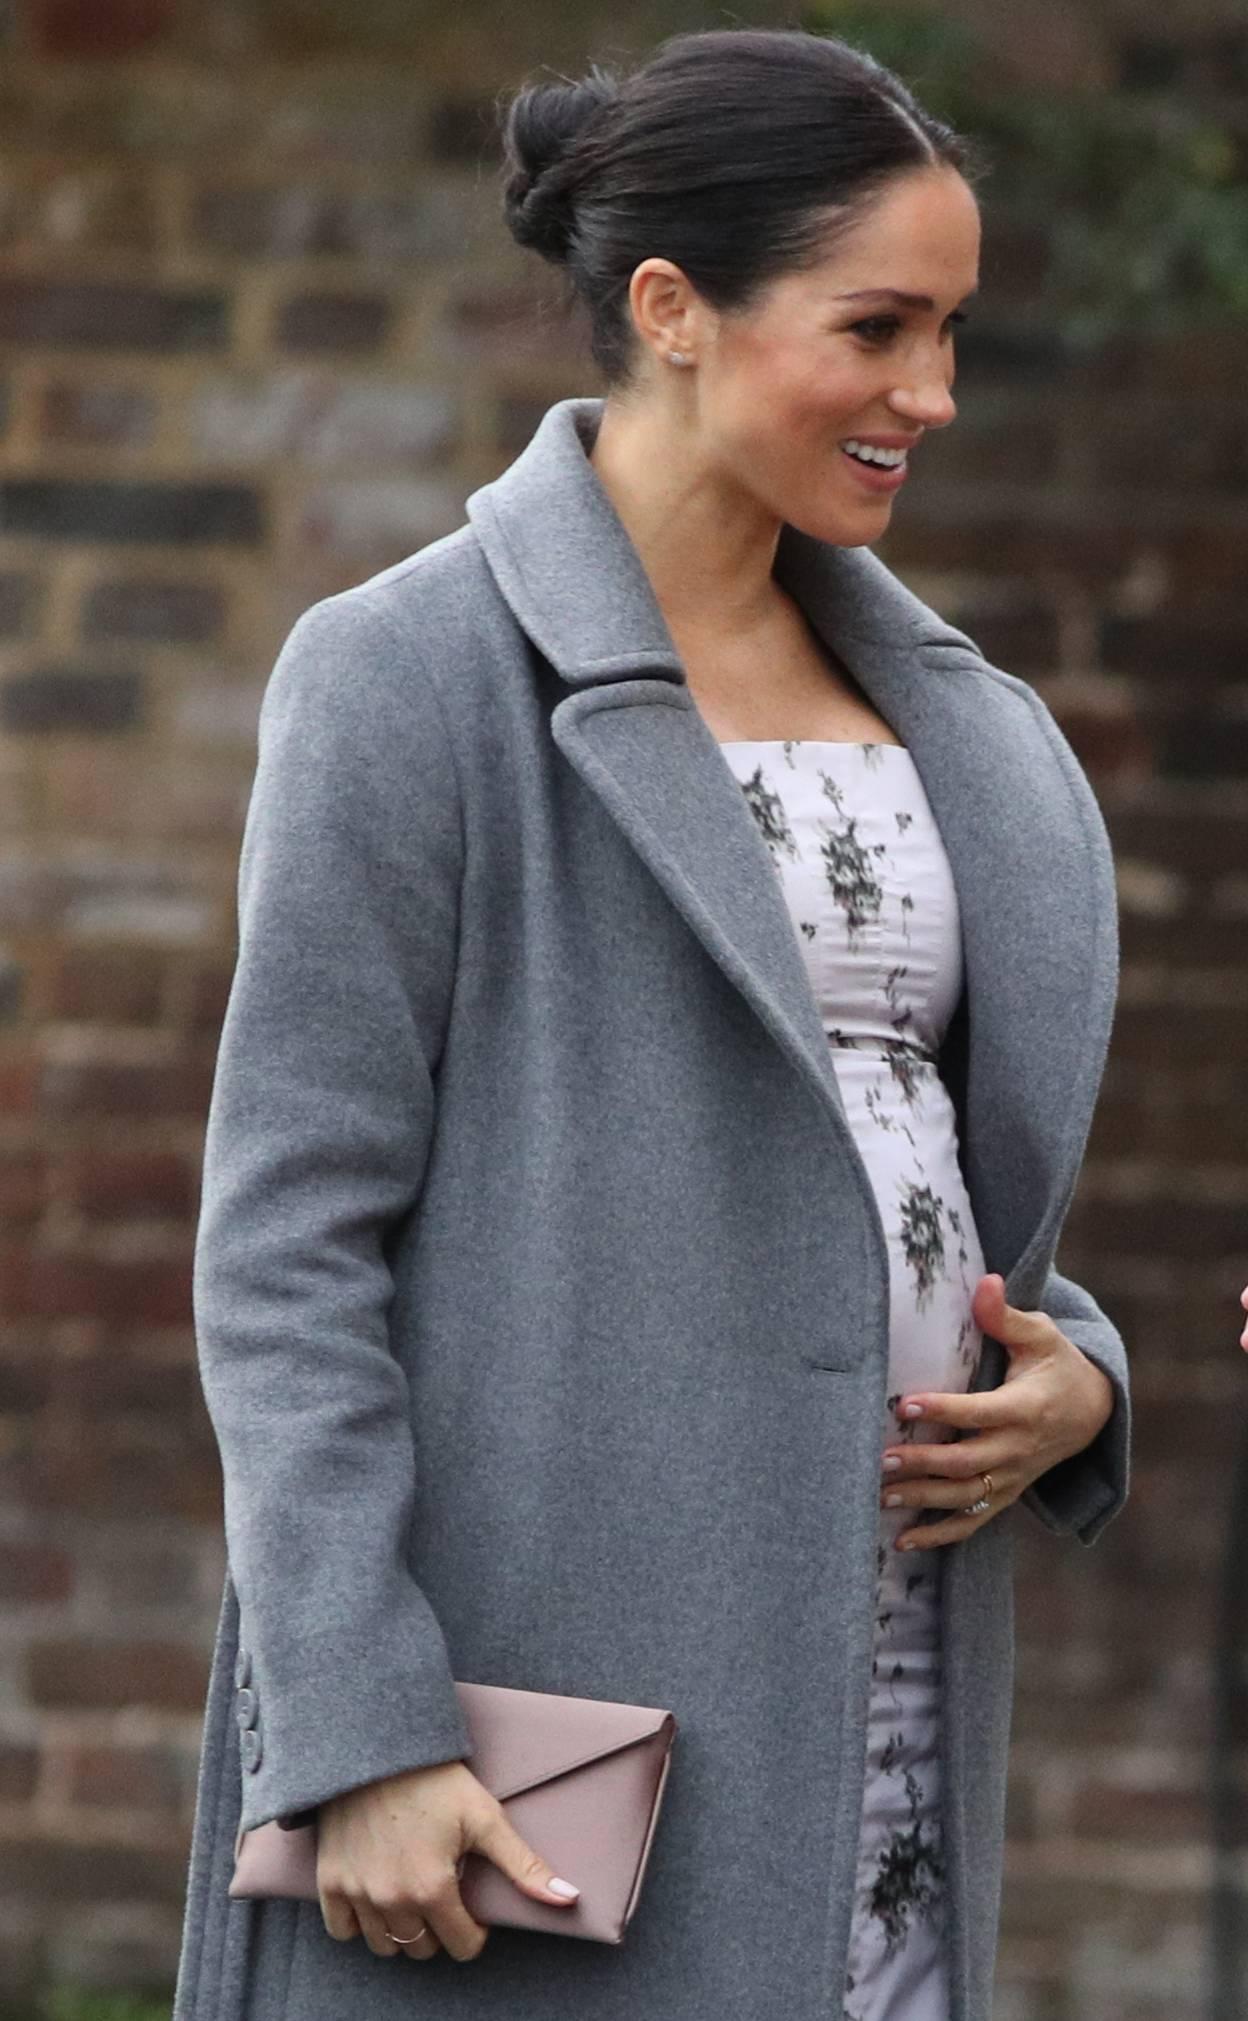 Meghan visits Royal Variety Charity care home